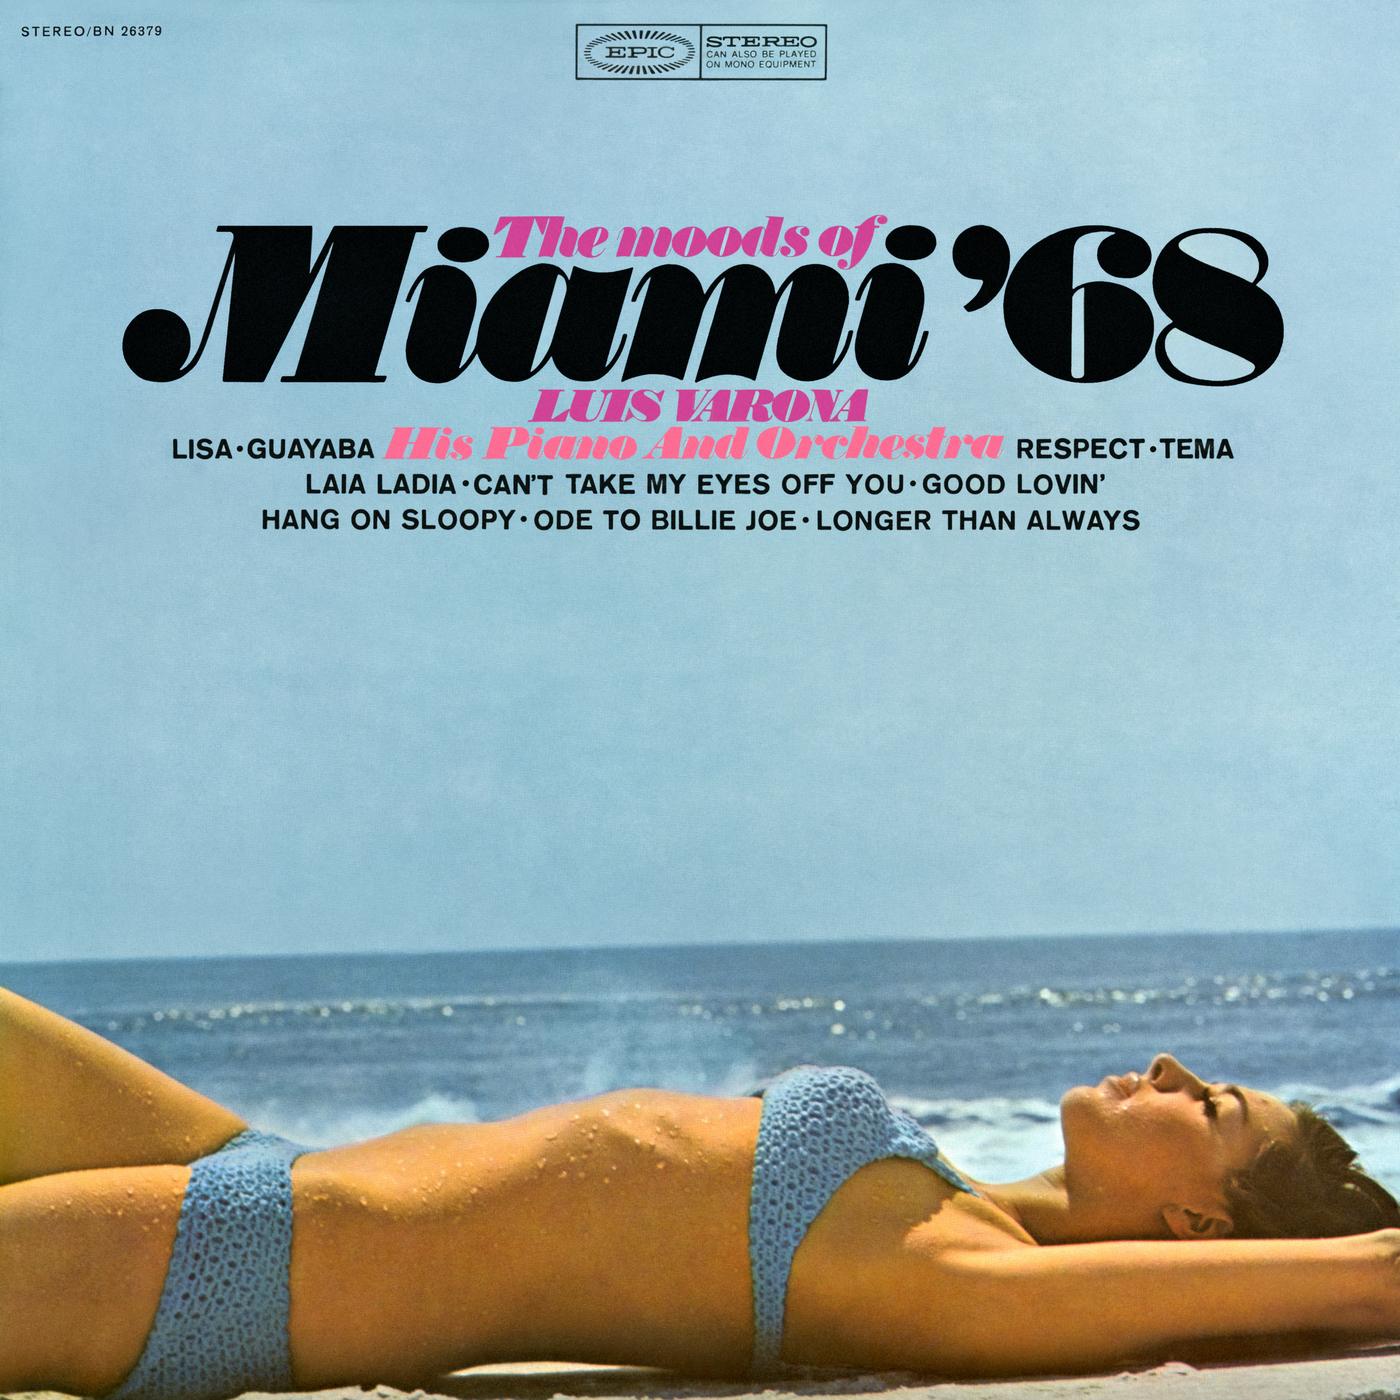 Moods of Miami '68 - Luis Varona